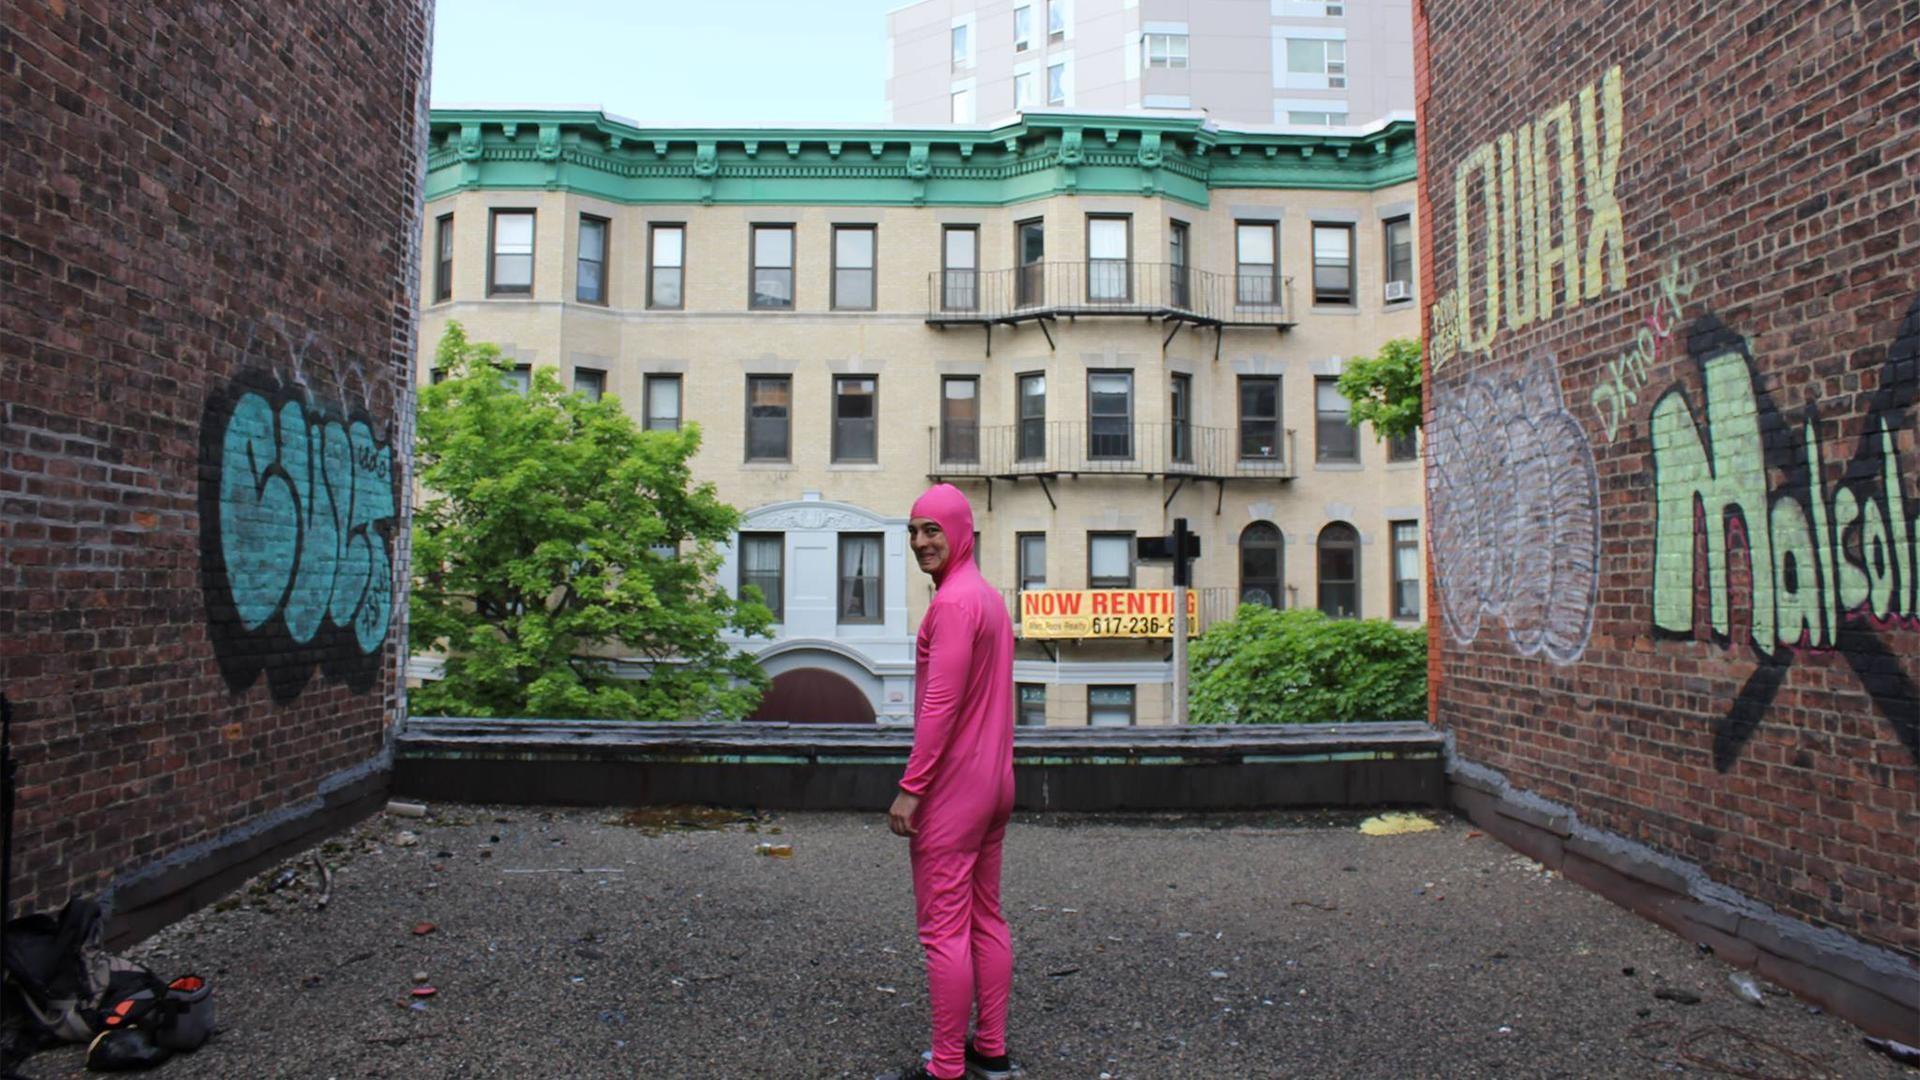 Pink Guy (1920 x 1080) …